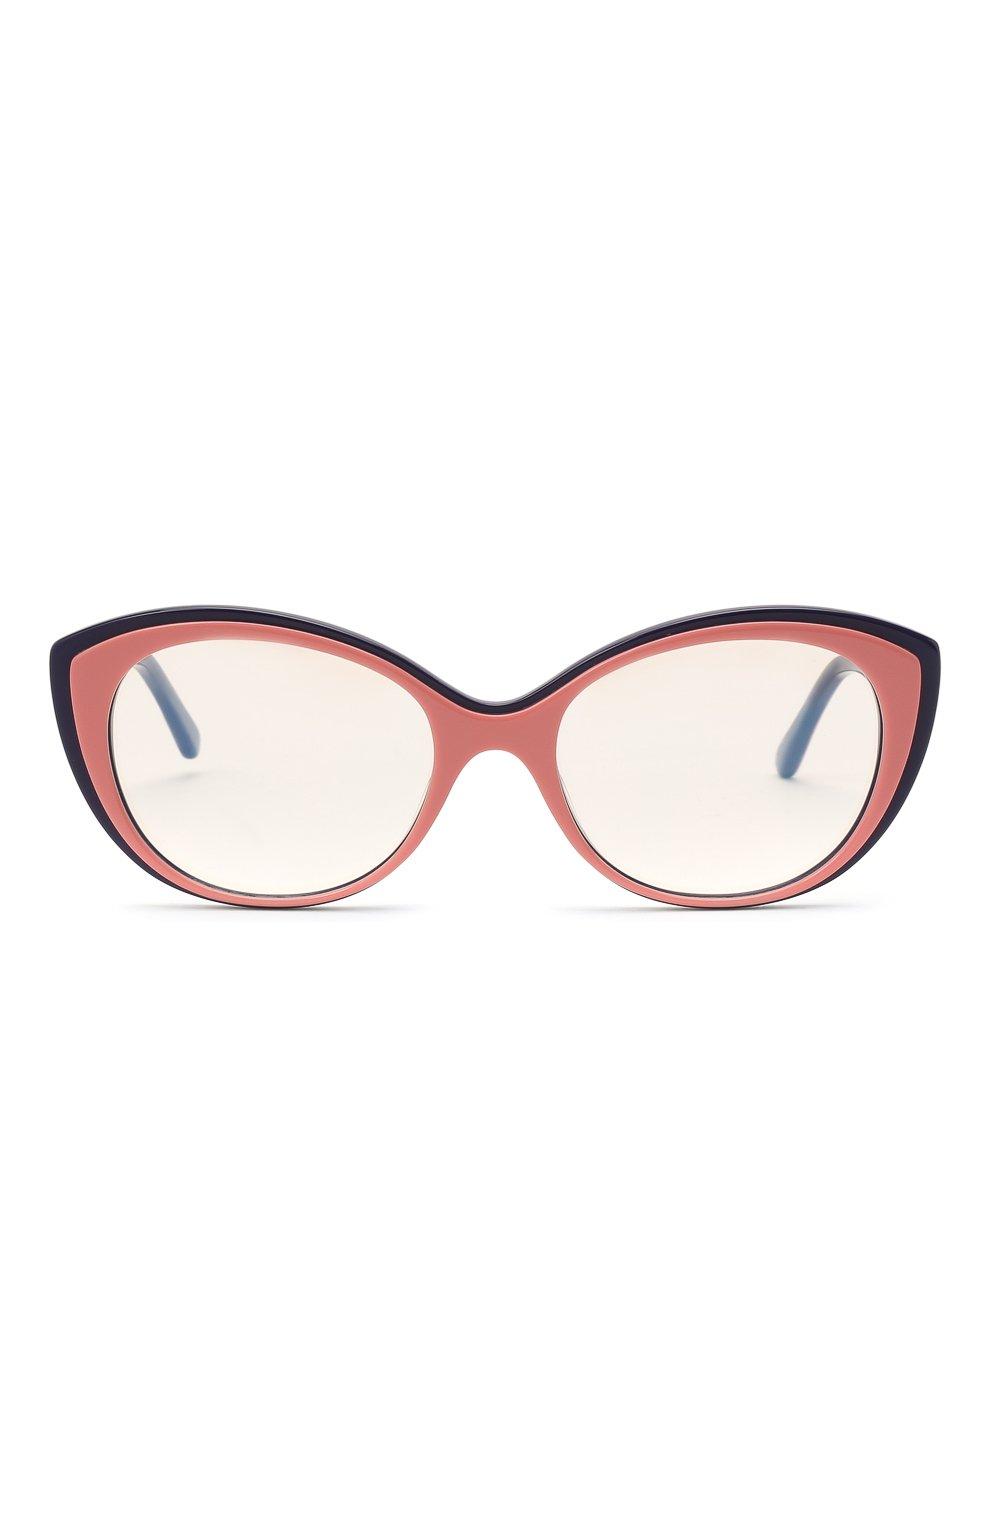 Детские оправа CAROLINE ABRAM розового цвета, арт. 10+14=24 1016   Фото 2 (Тип очков: Оправа; Очки форма: Cat-eye, Бабочка)